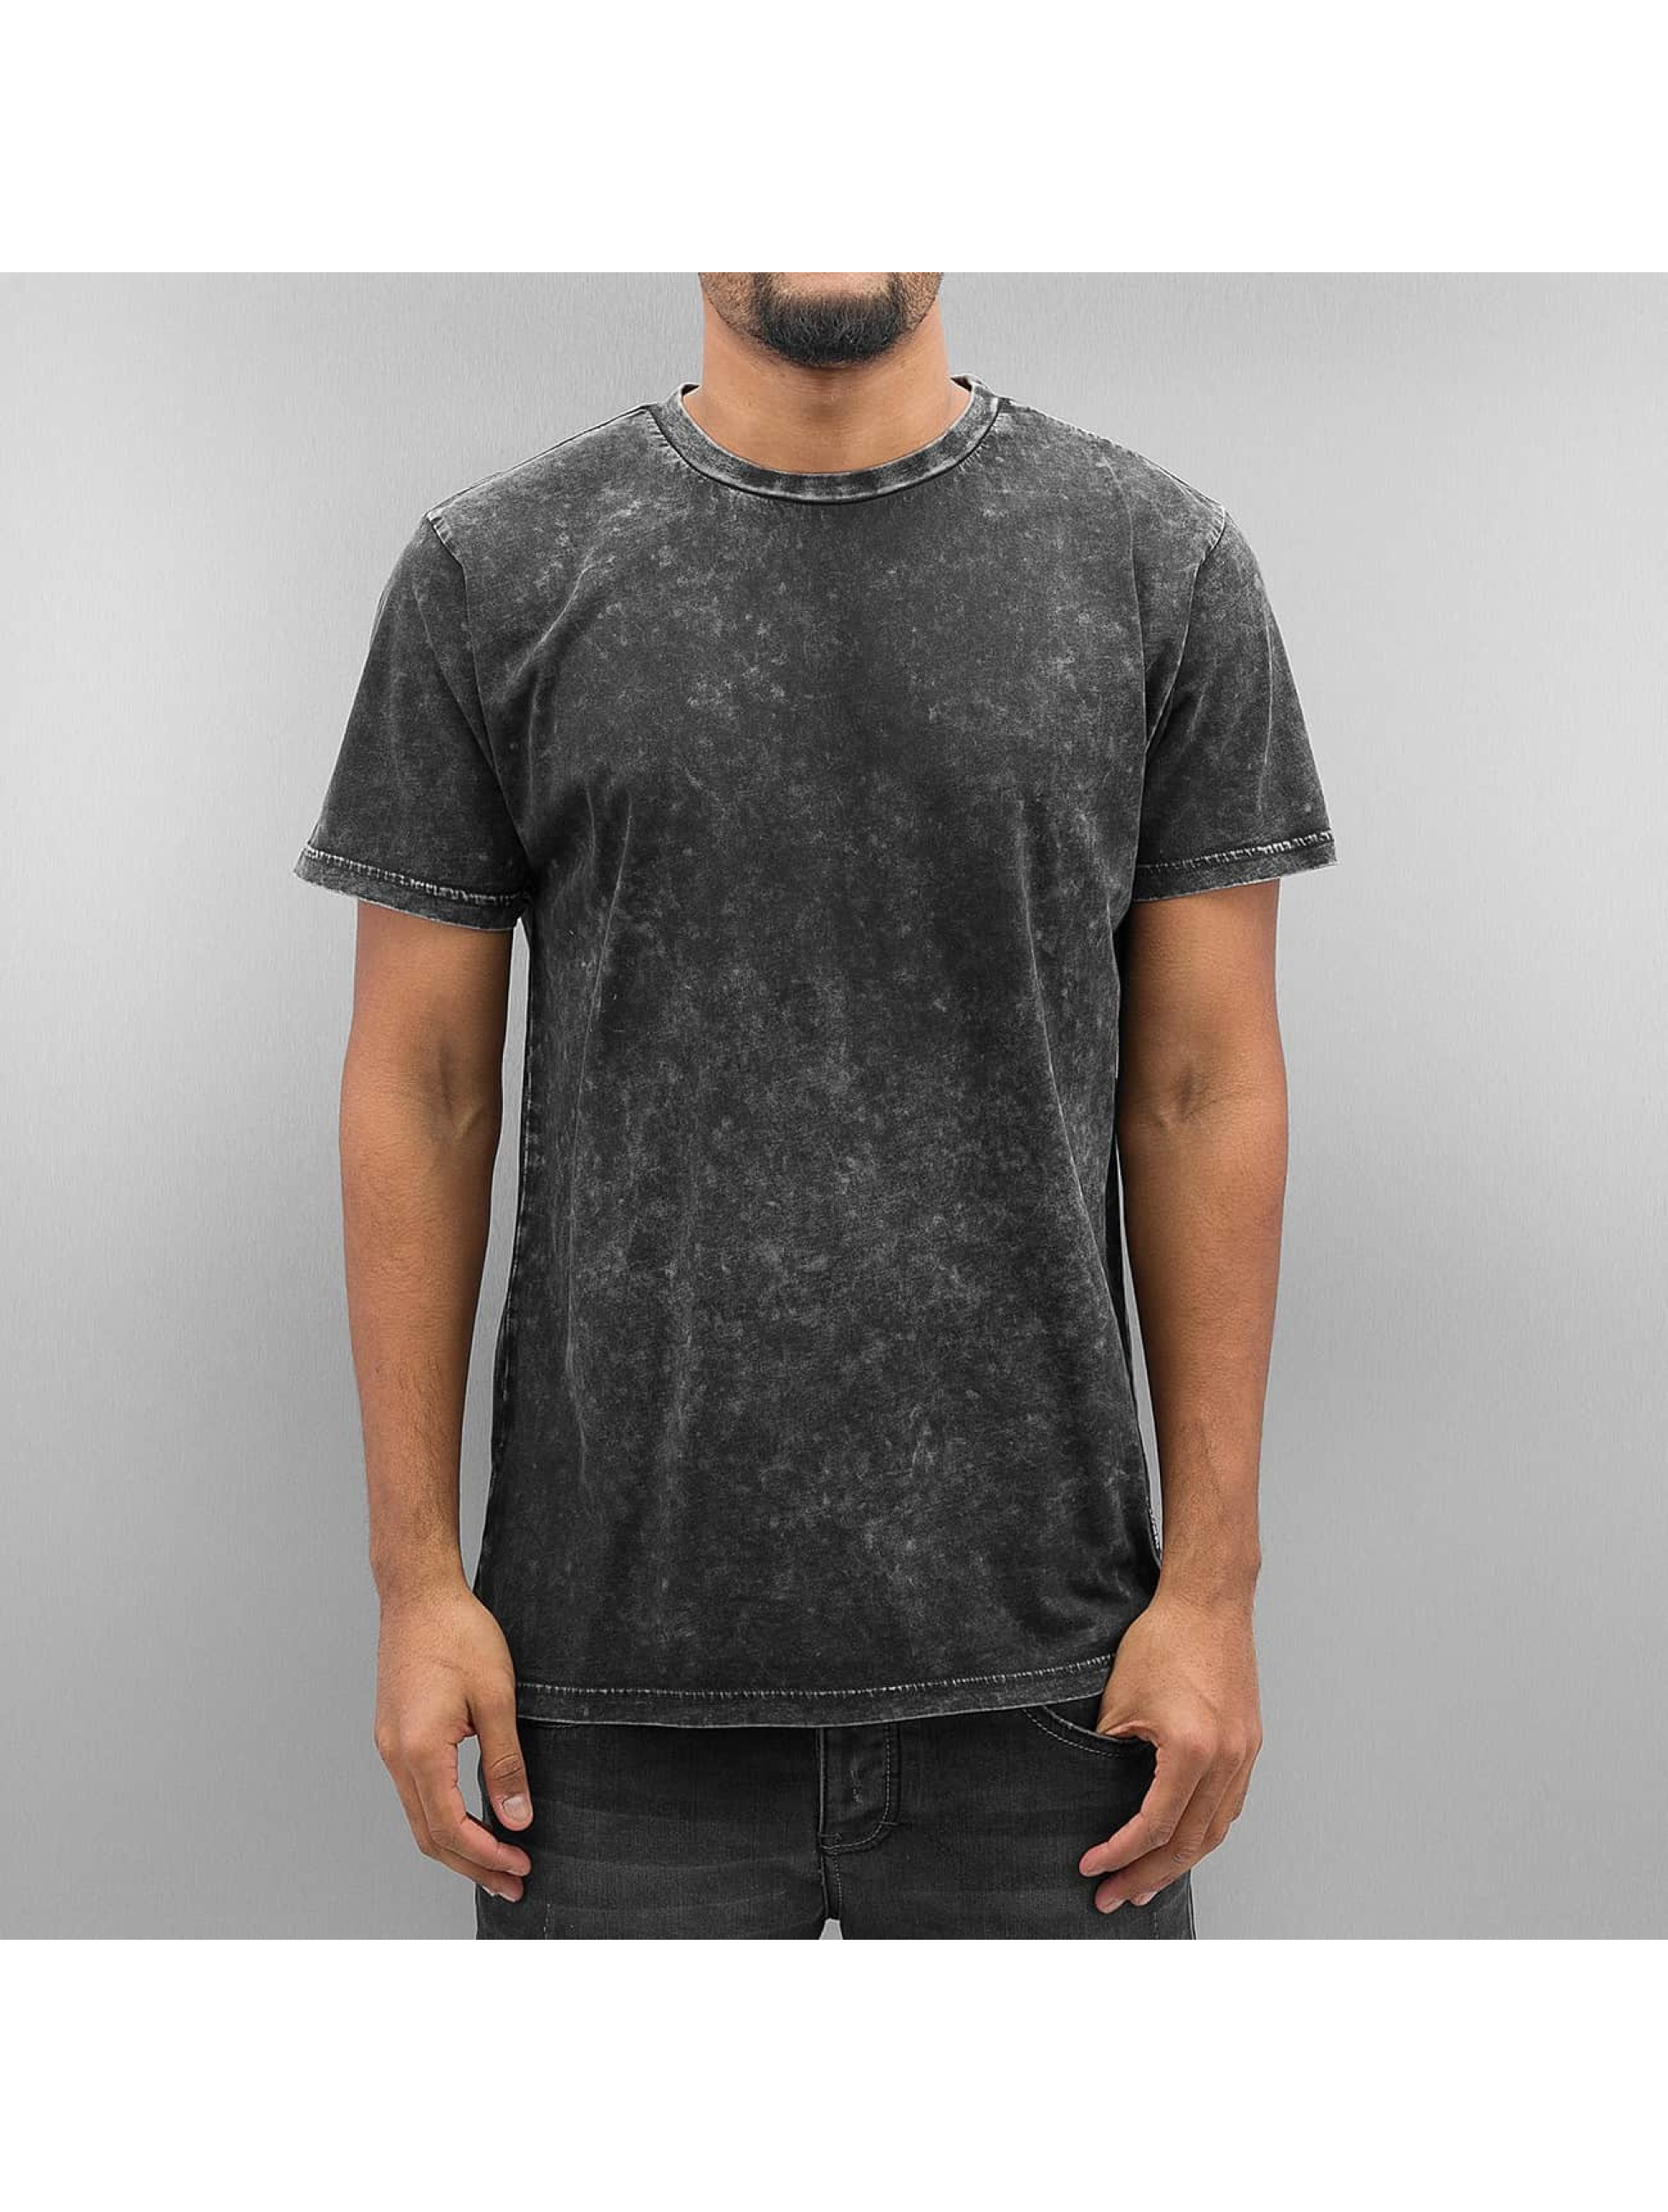 NEFF T-Shirt Contact black